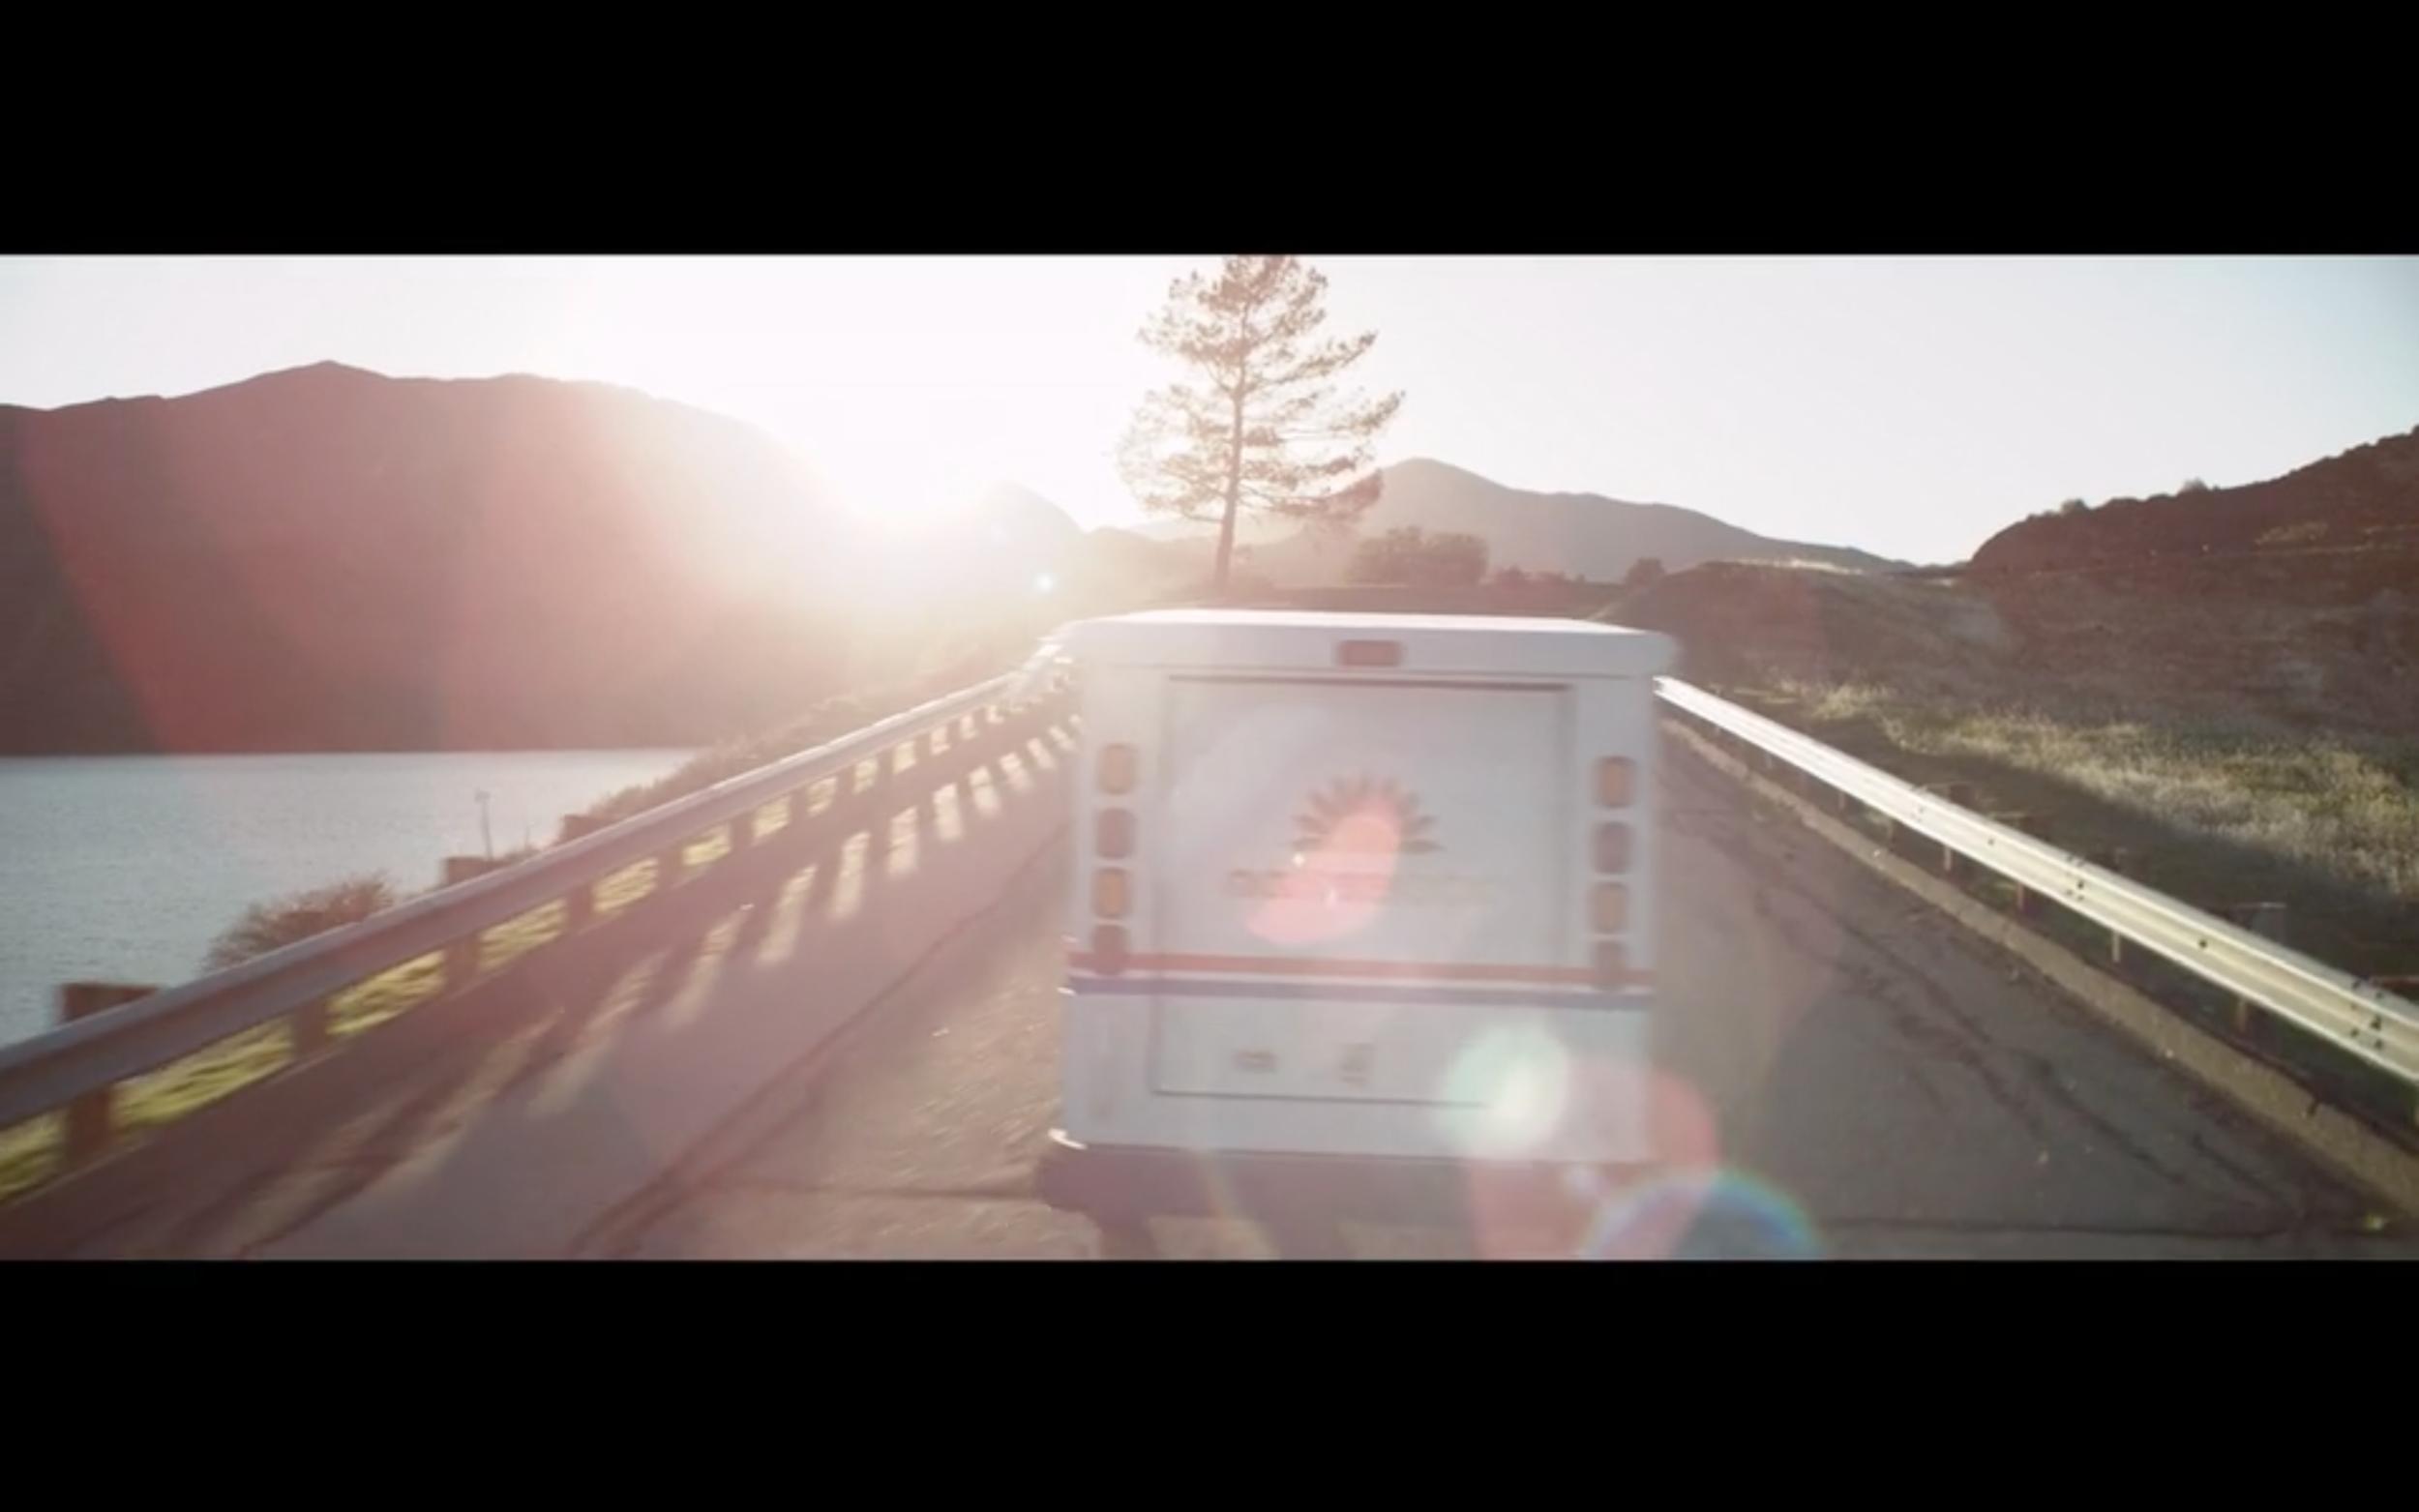 USPS: Trucks